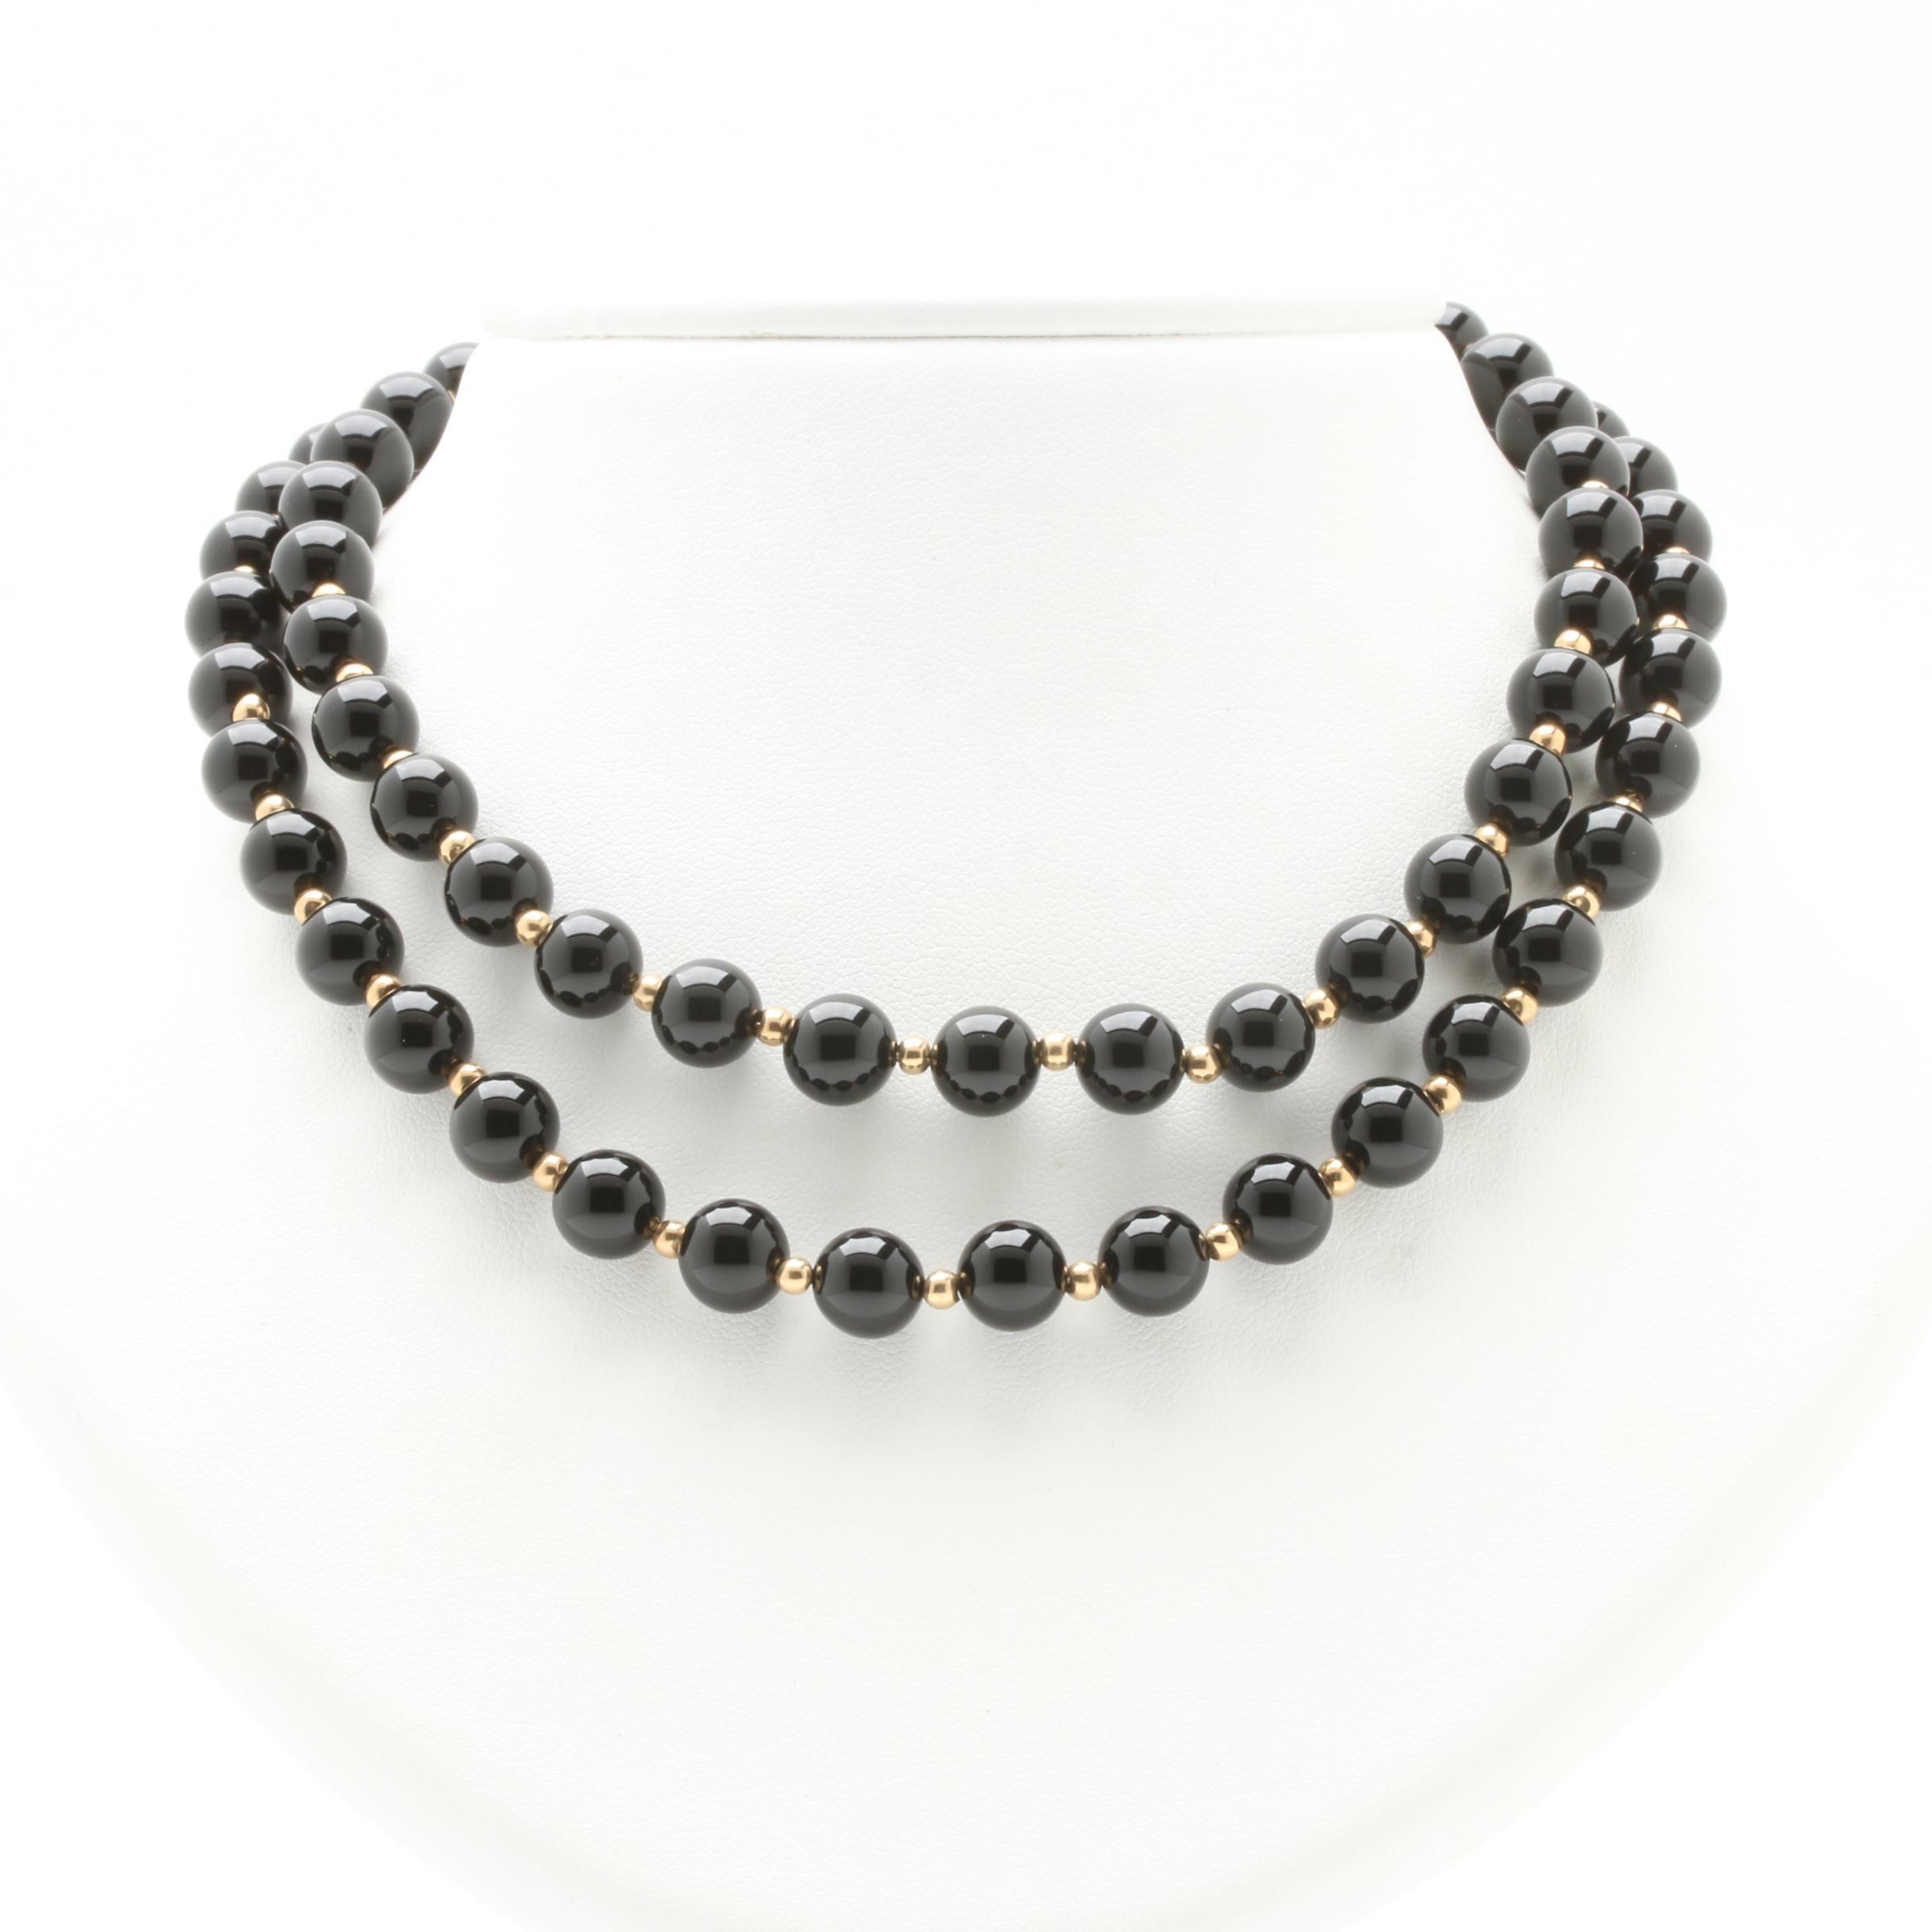 14K Yellow Gold Black Onyx Beaded Strand Necklace